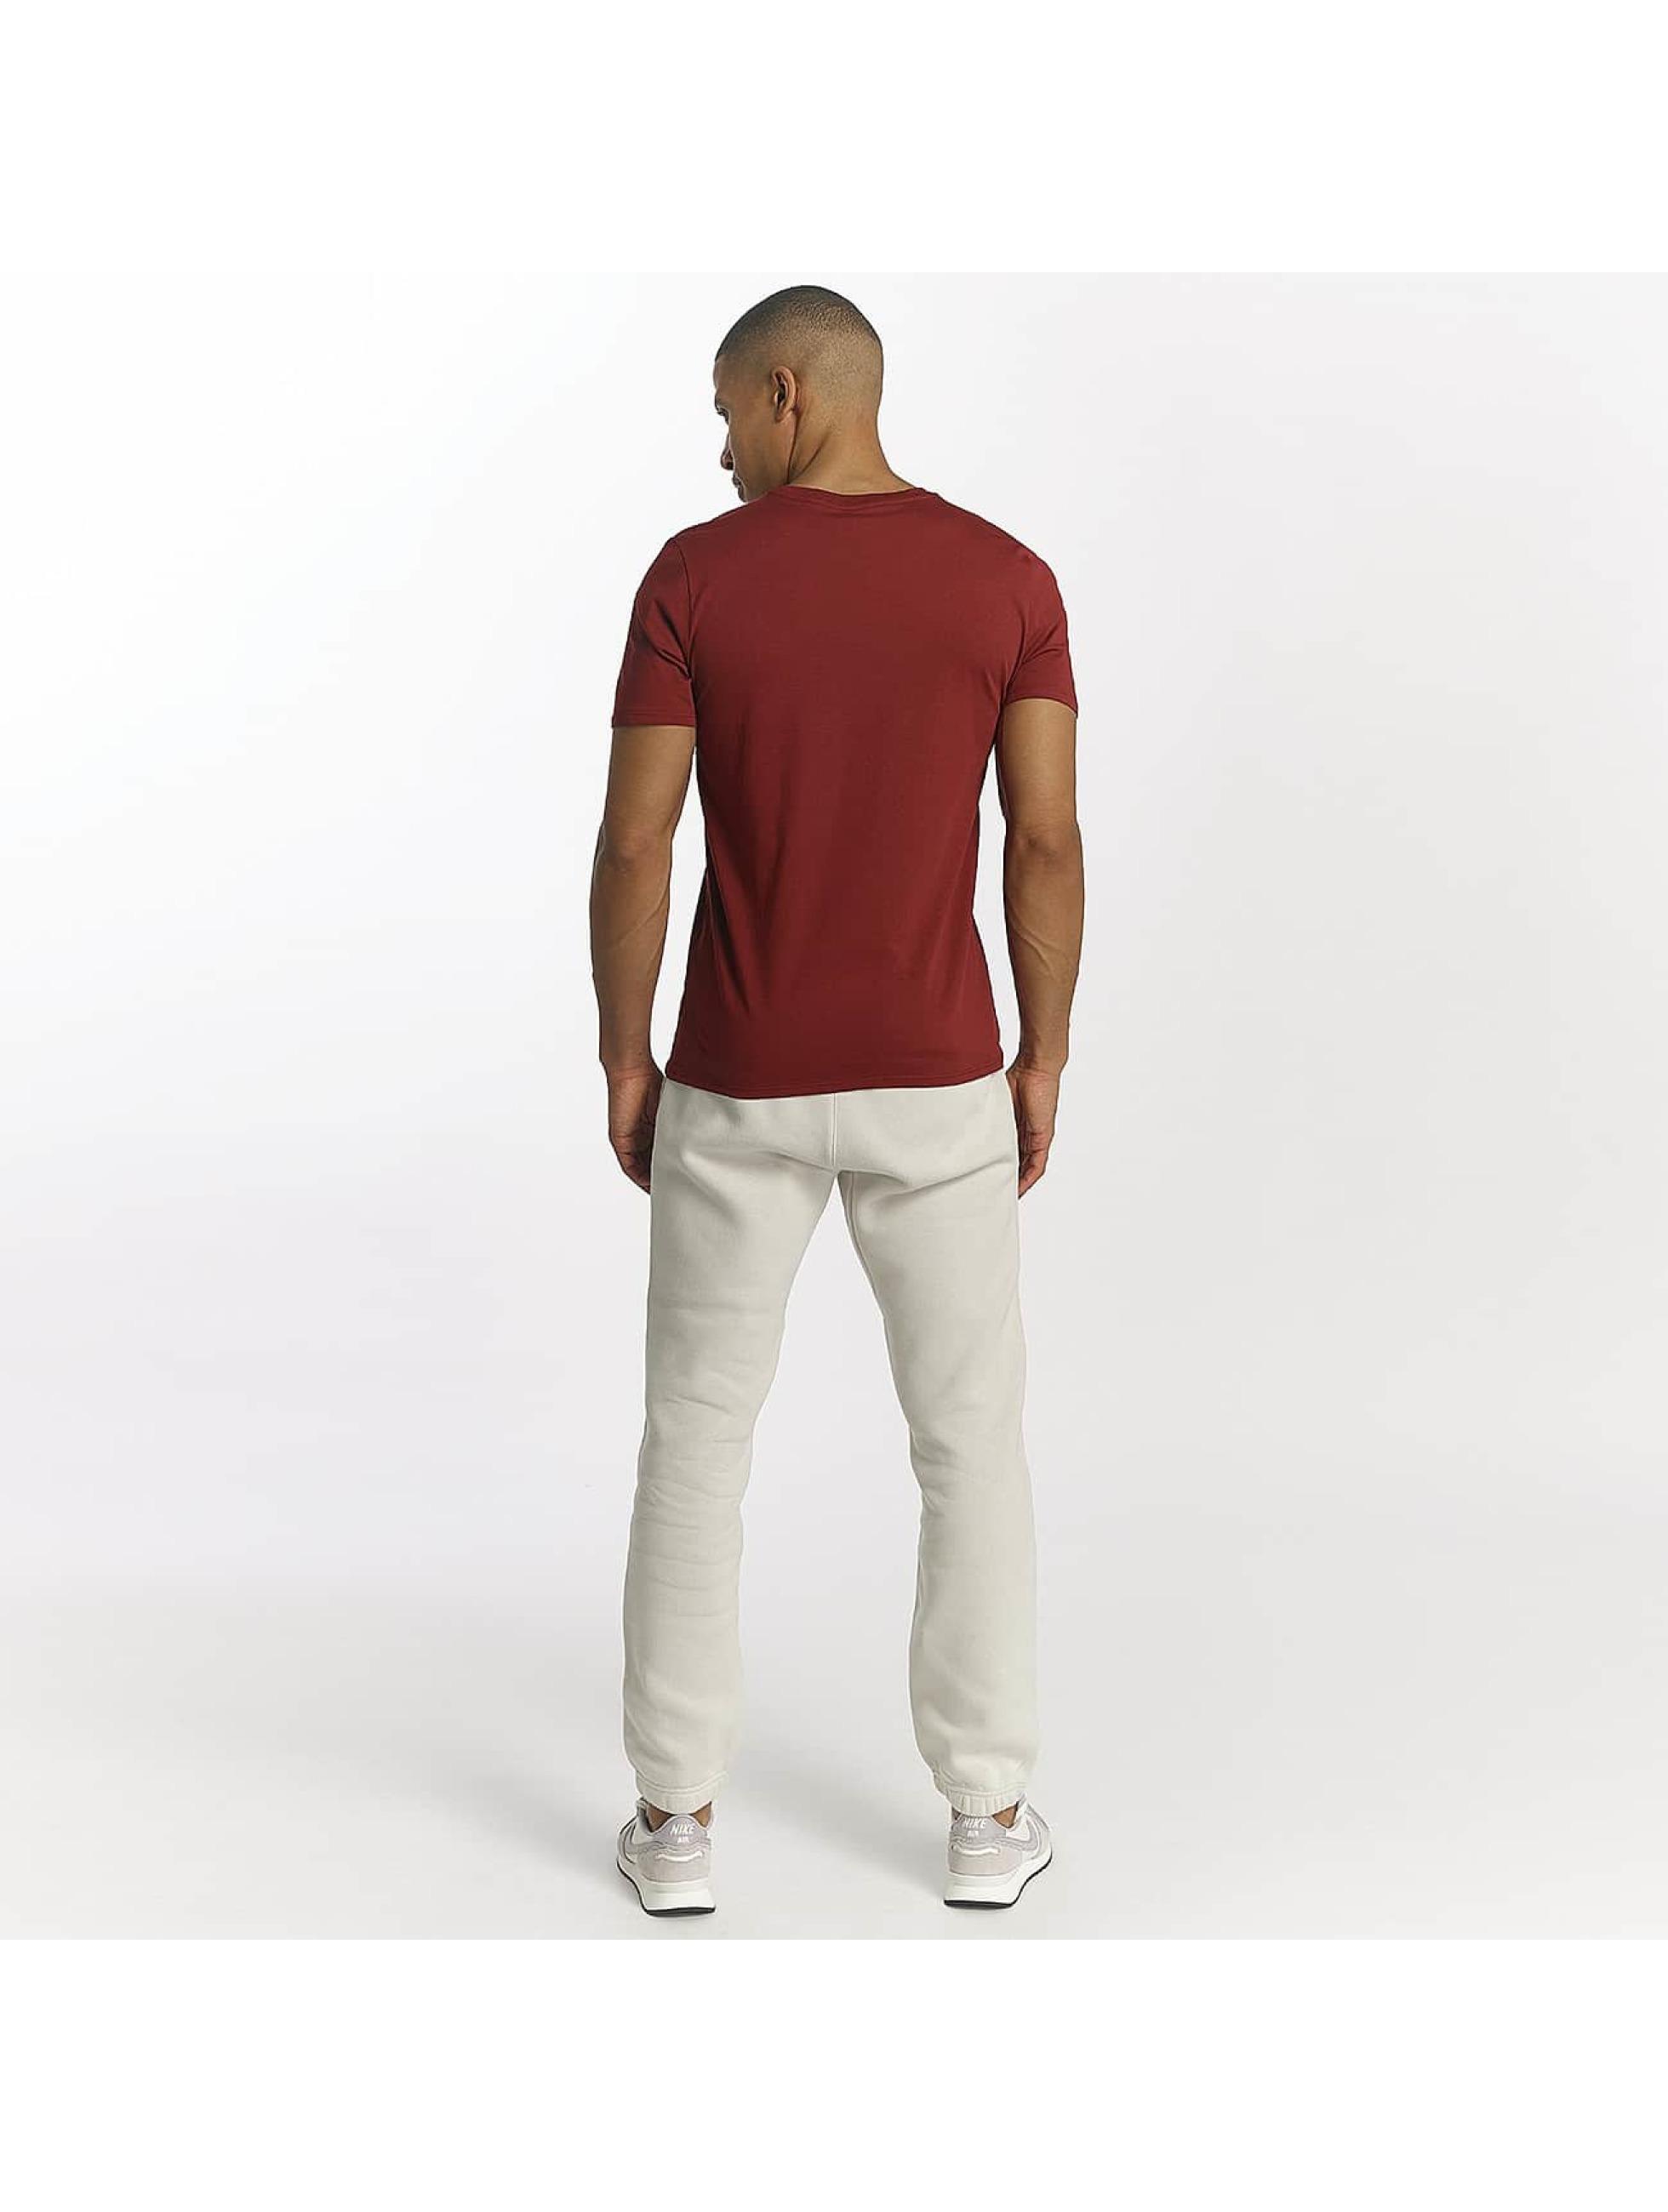 Nike Camiseta New JDI rojo